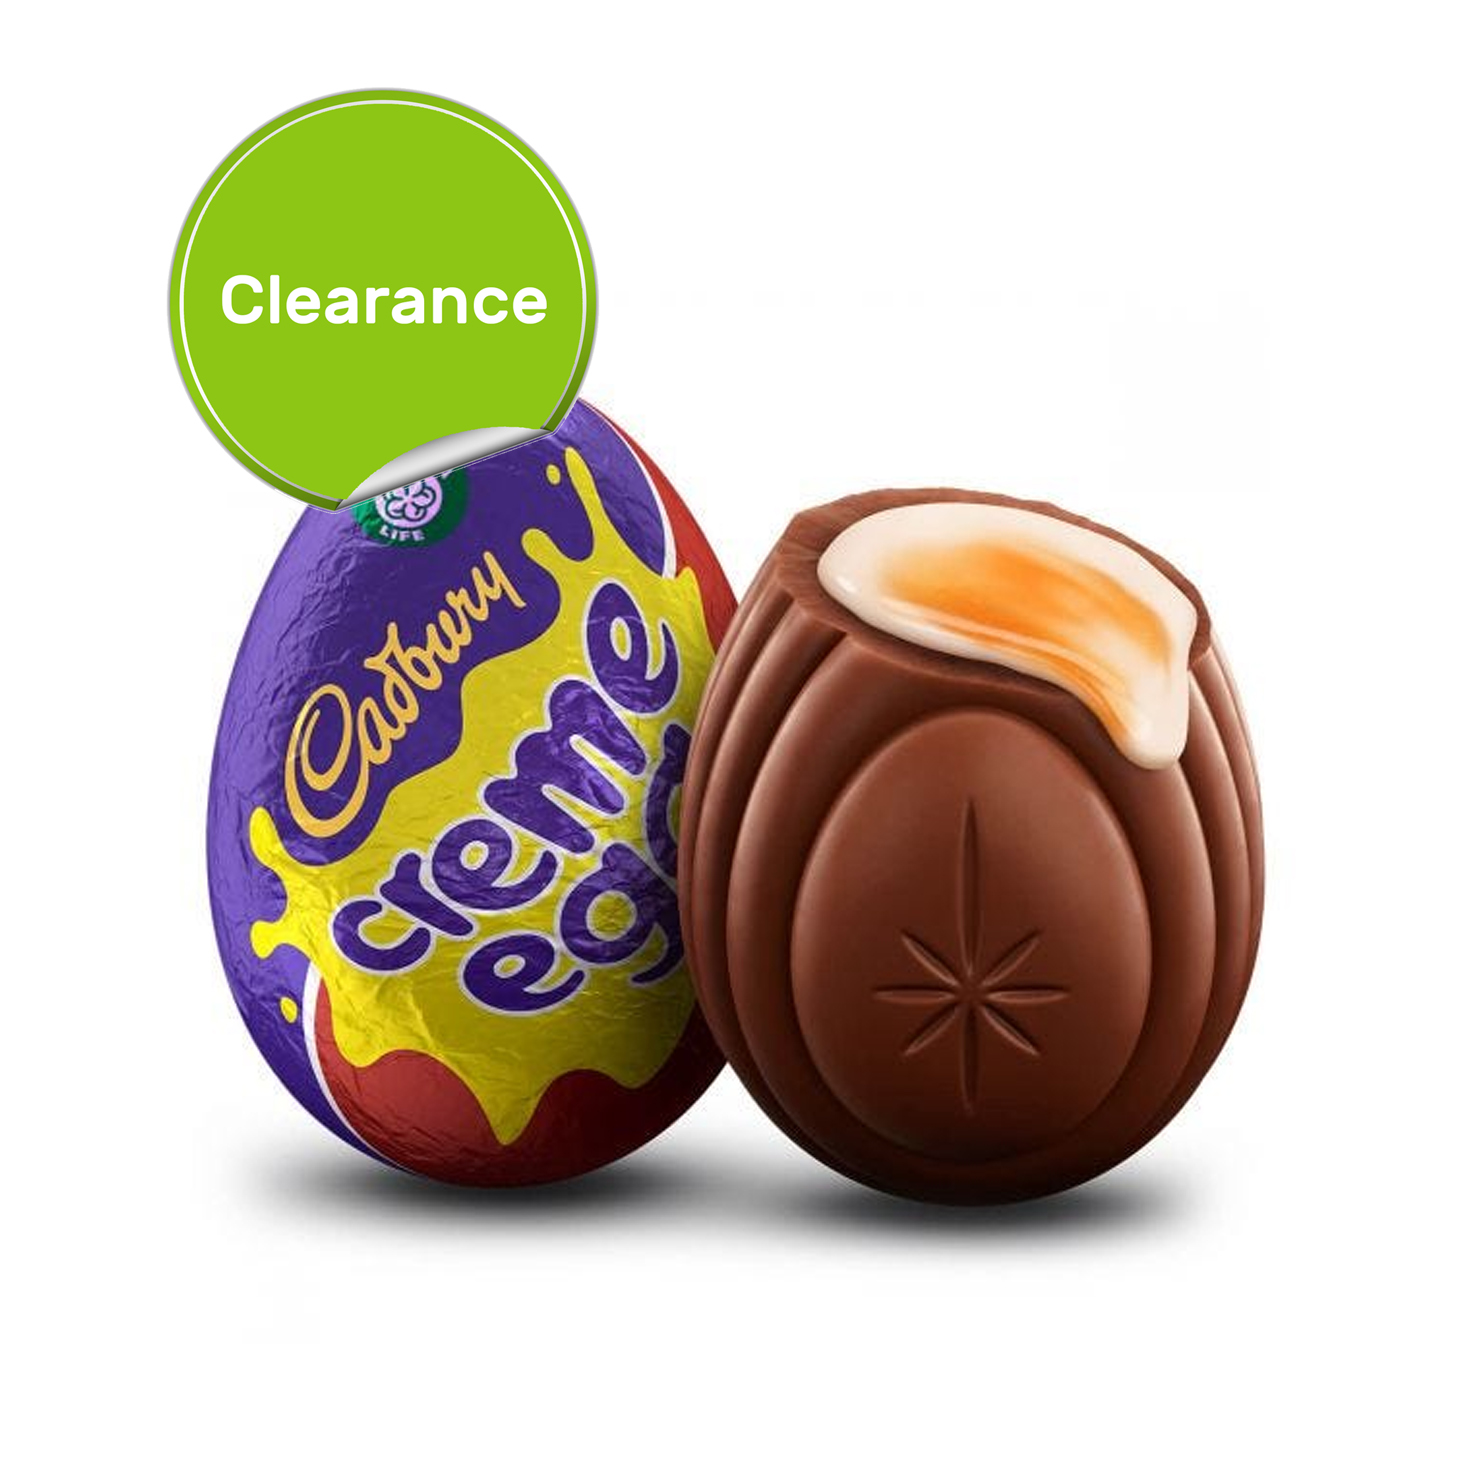 Best Before 31/07/2021 Cadbury Creme Egg